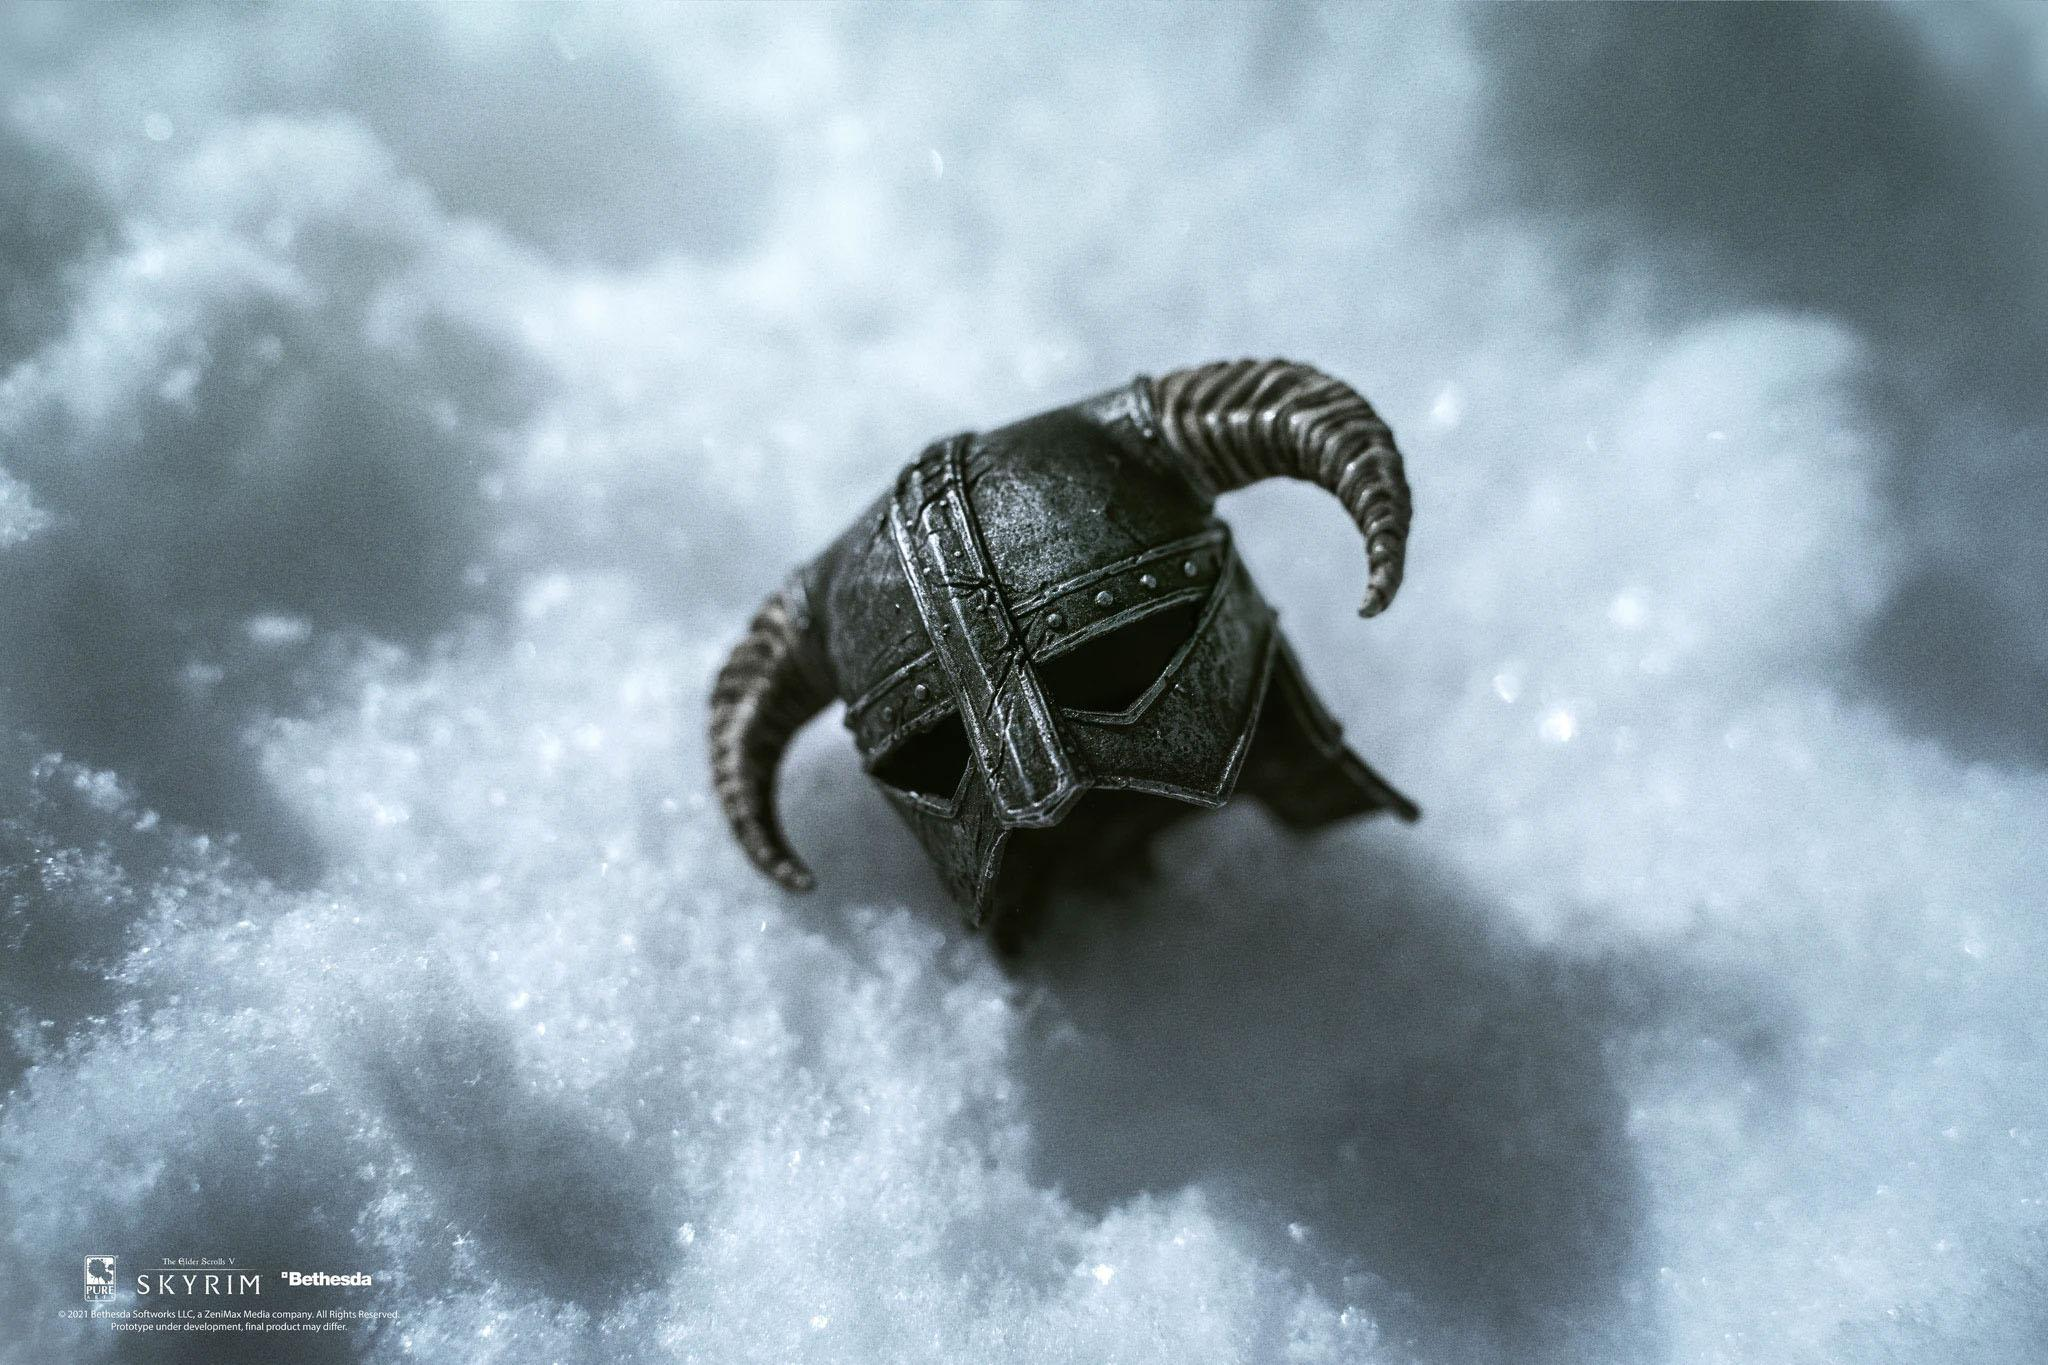 Image du jeu The Elder Scrolls le jeu de rôle